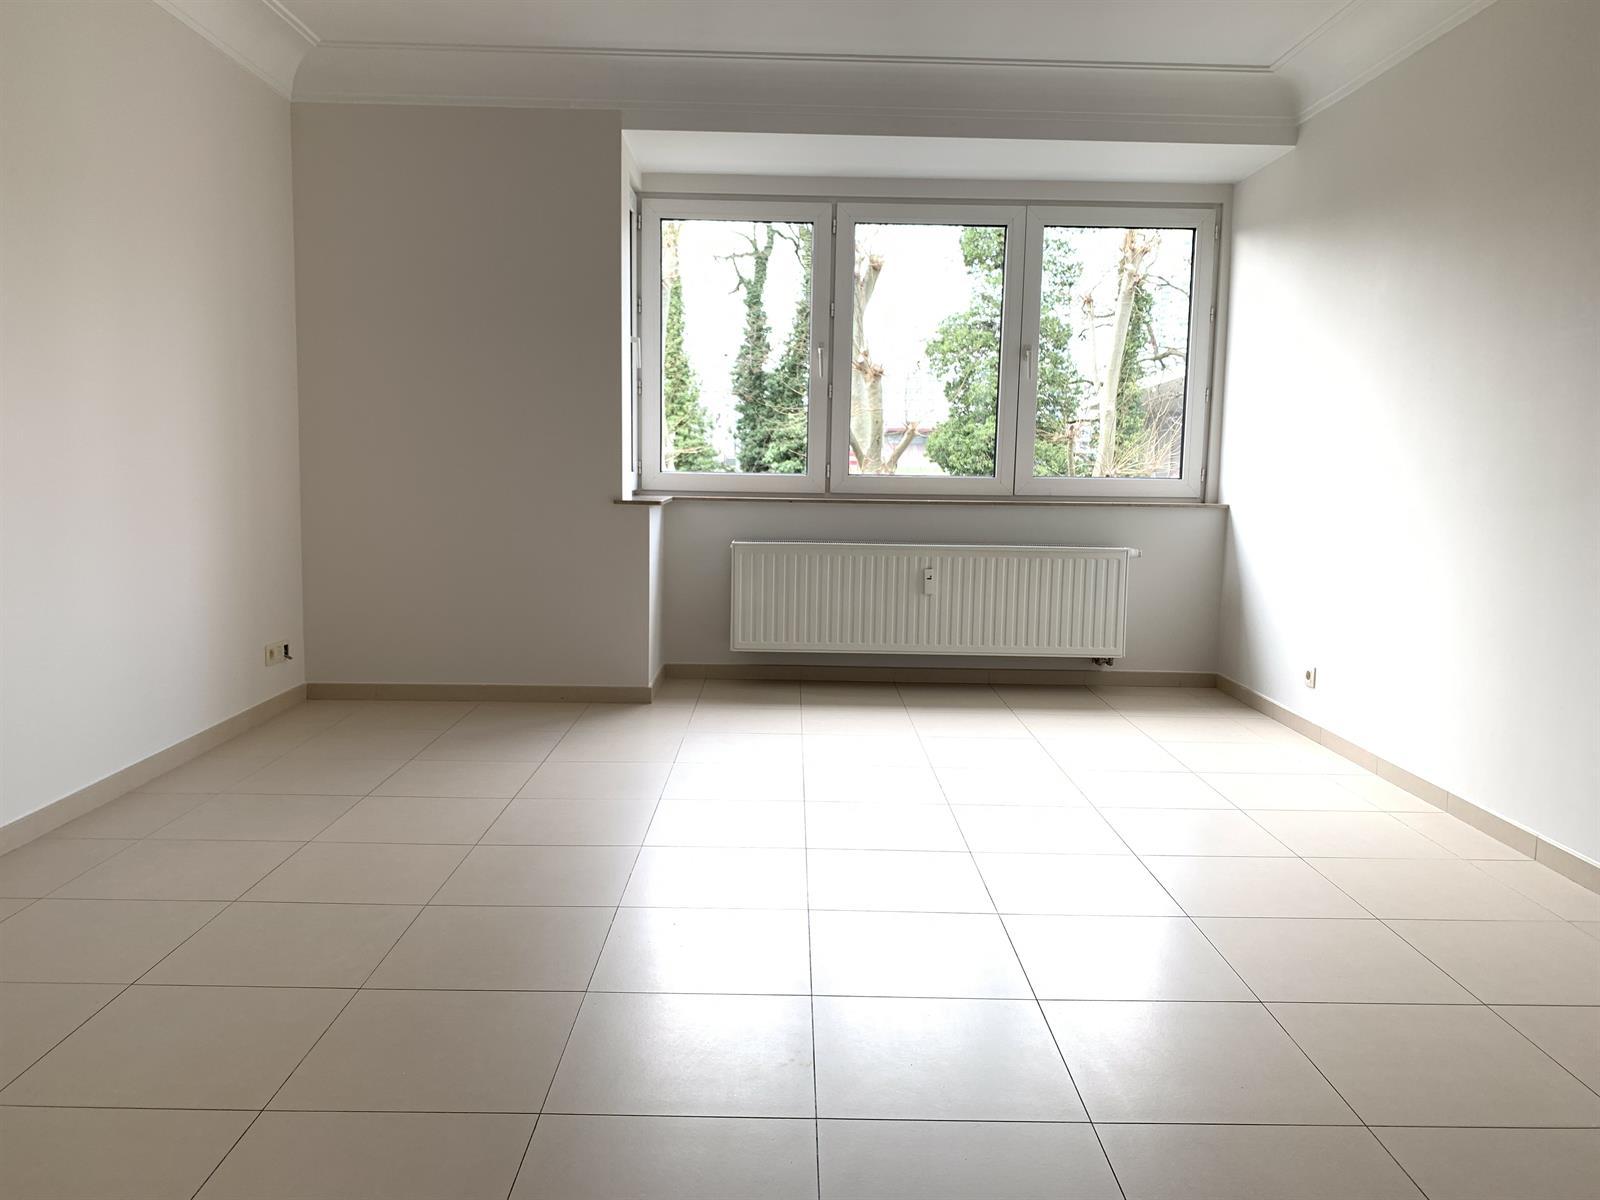 Appartement - Molenbeek-Saint-Jean - #4252746-0